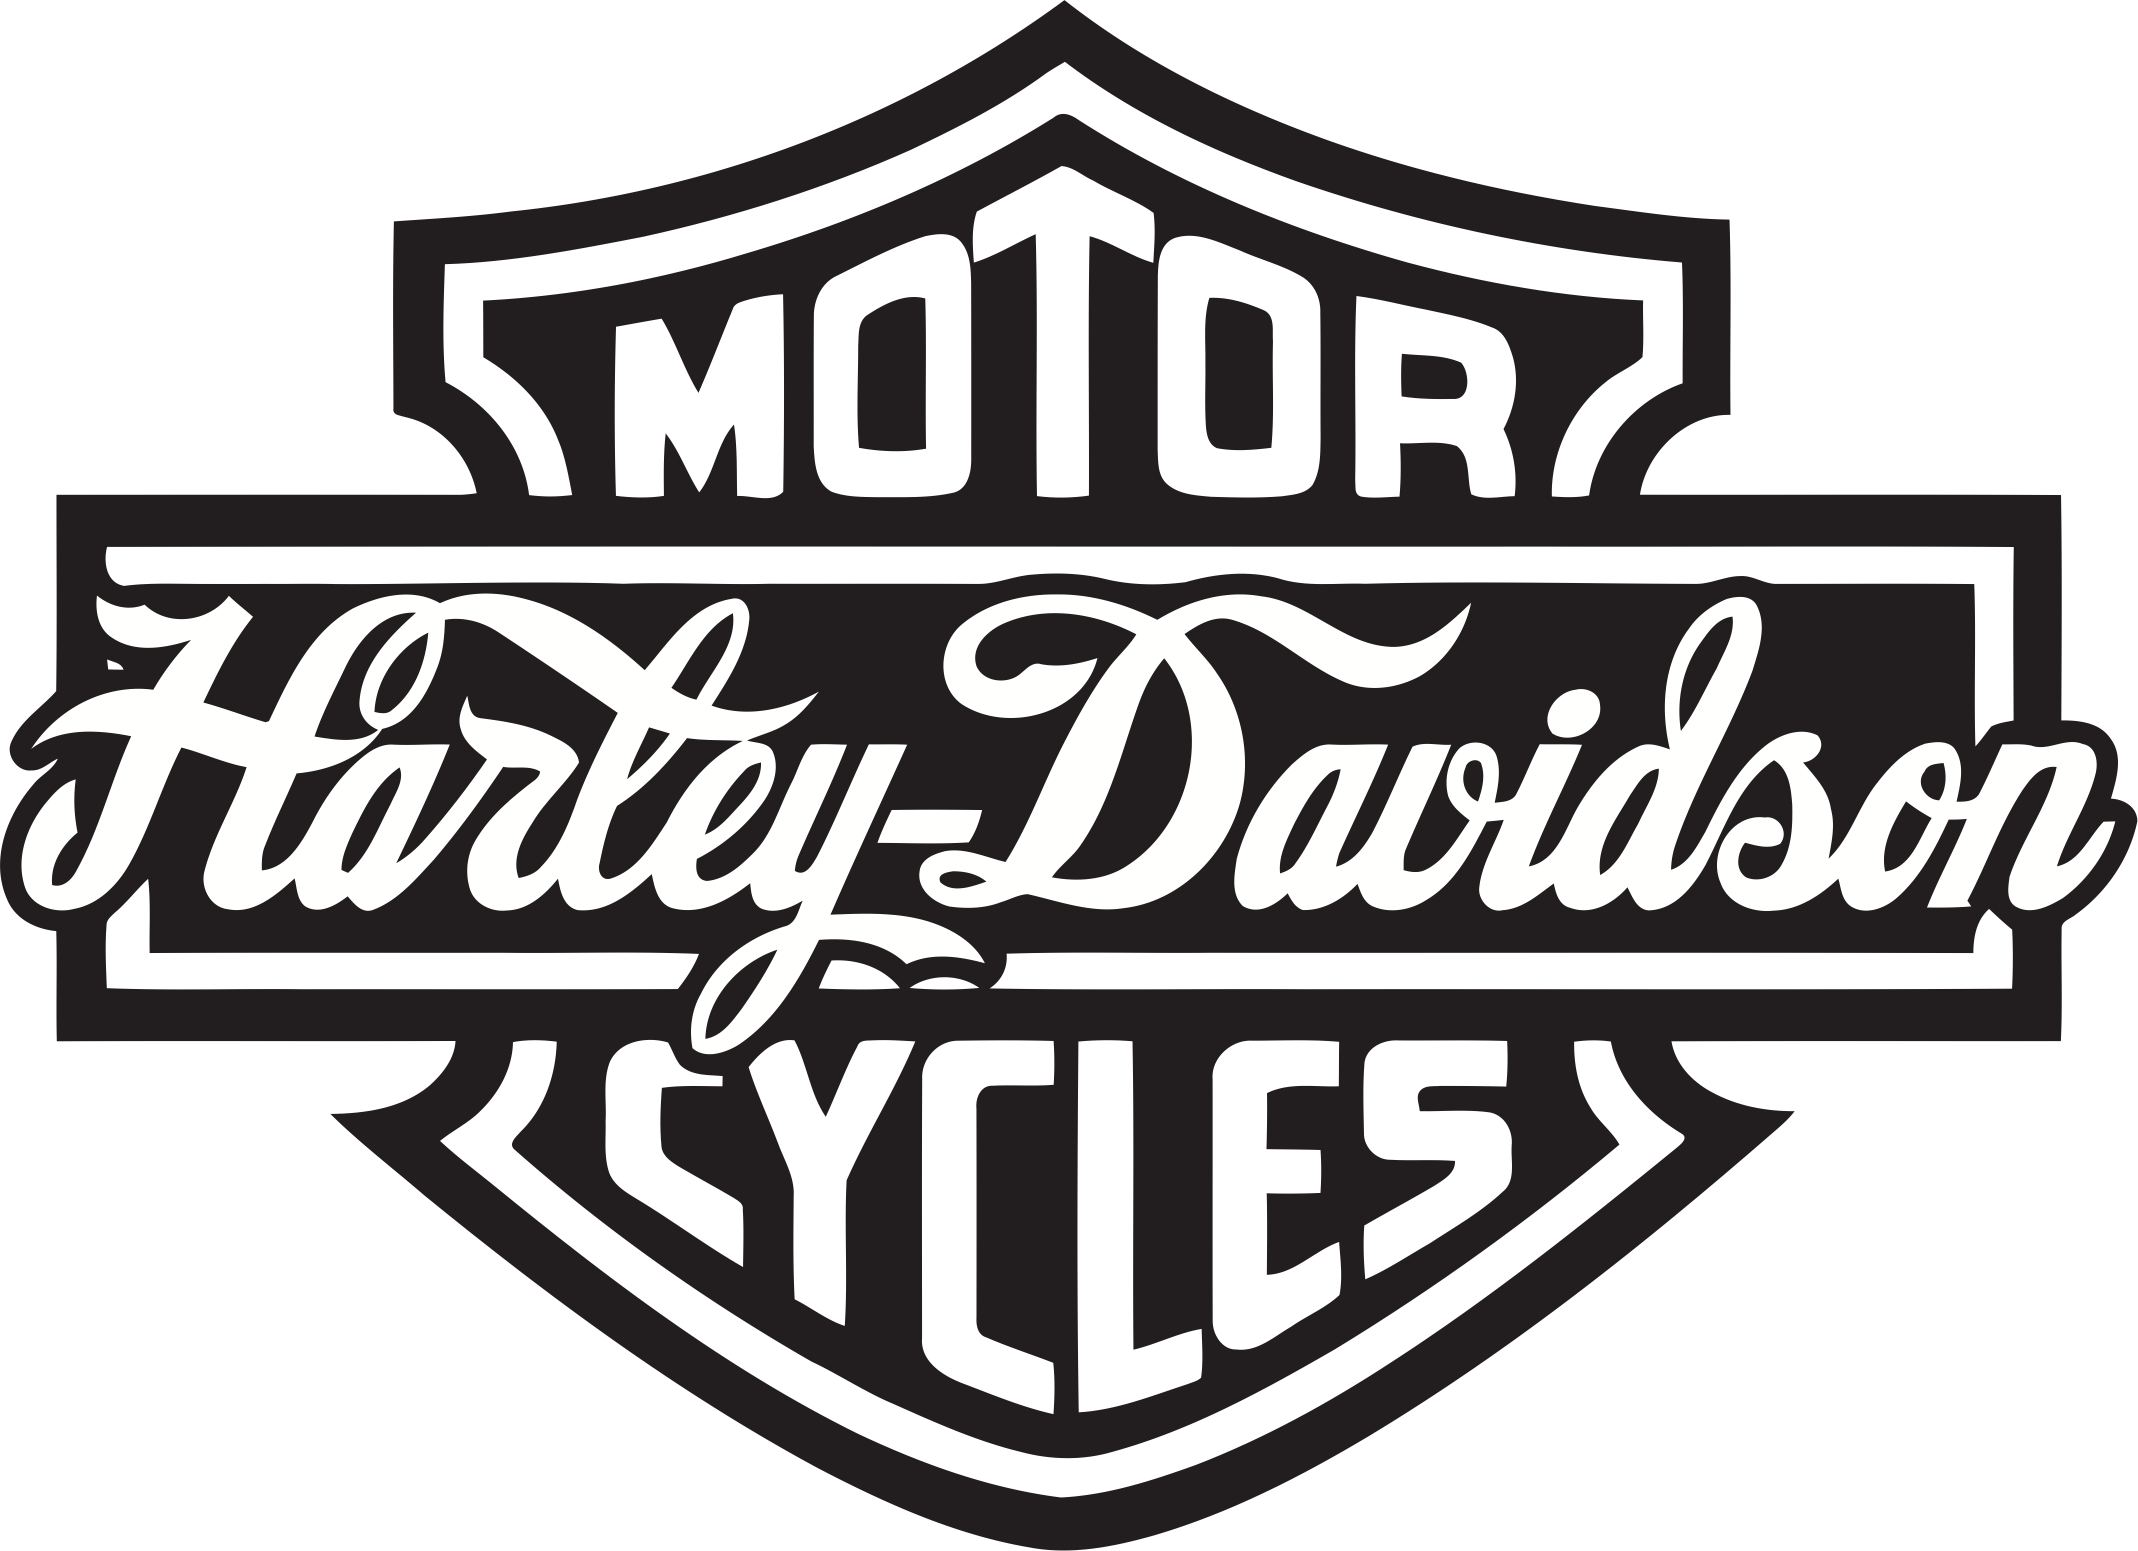 Harley Davidson Logo Png Image Harley Davidson Logo Harley Davidson Crafts Harley Davidson Helmets